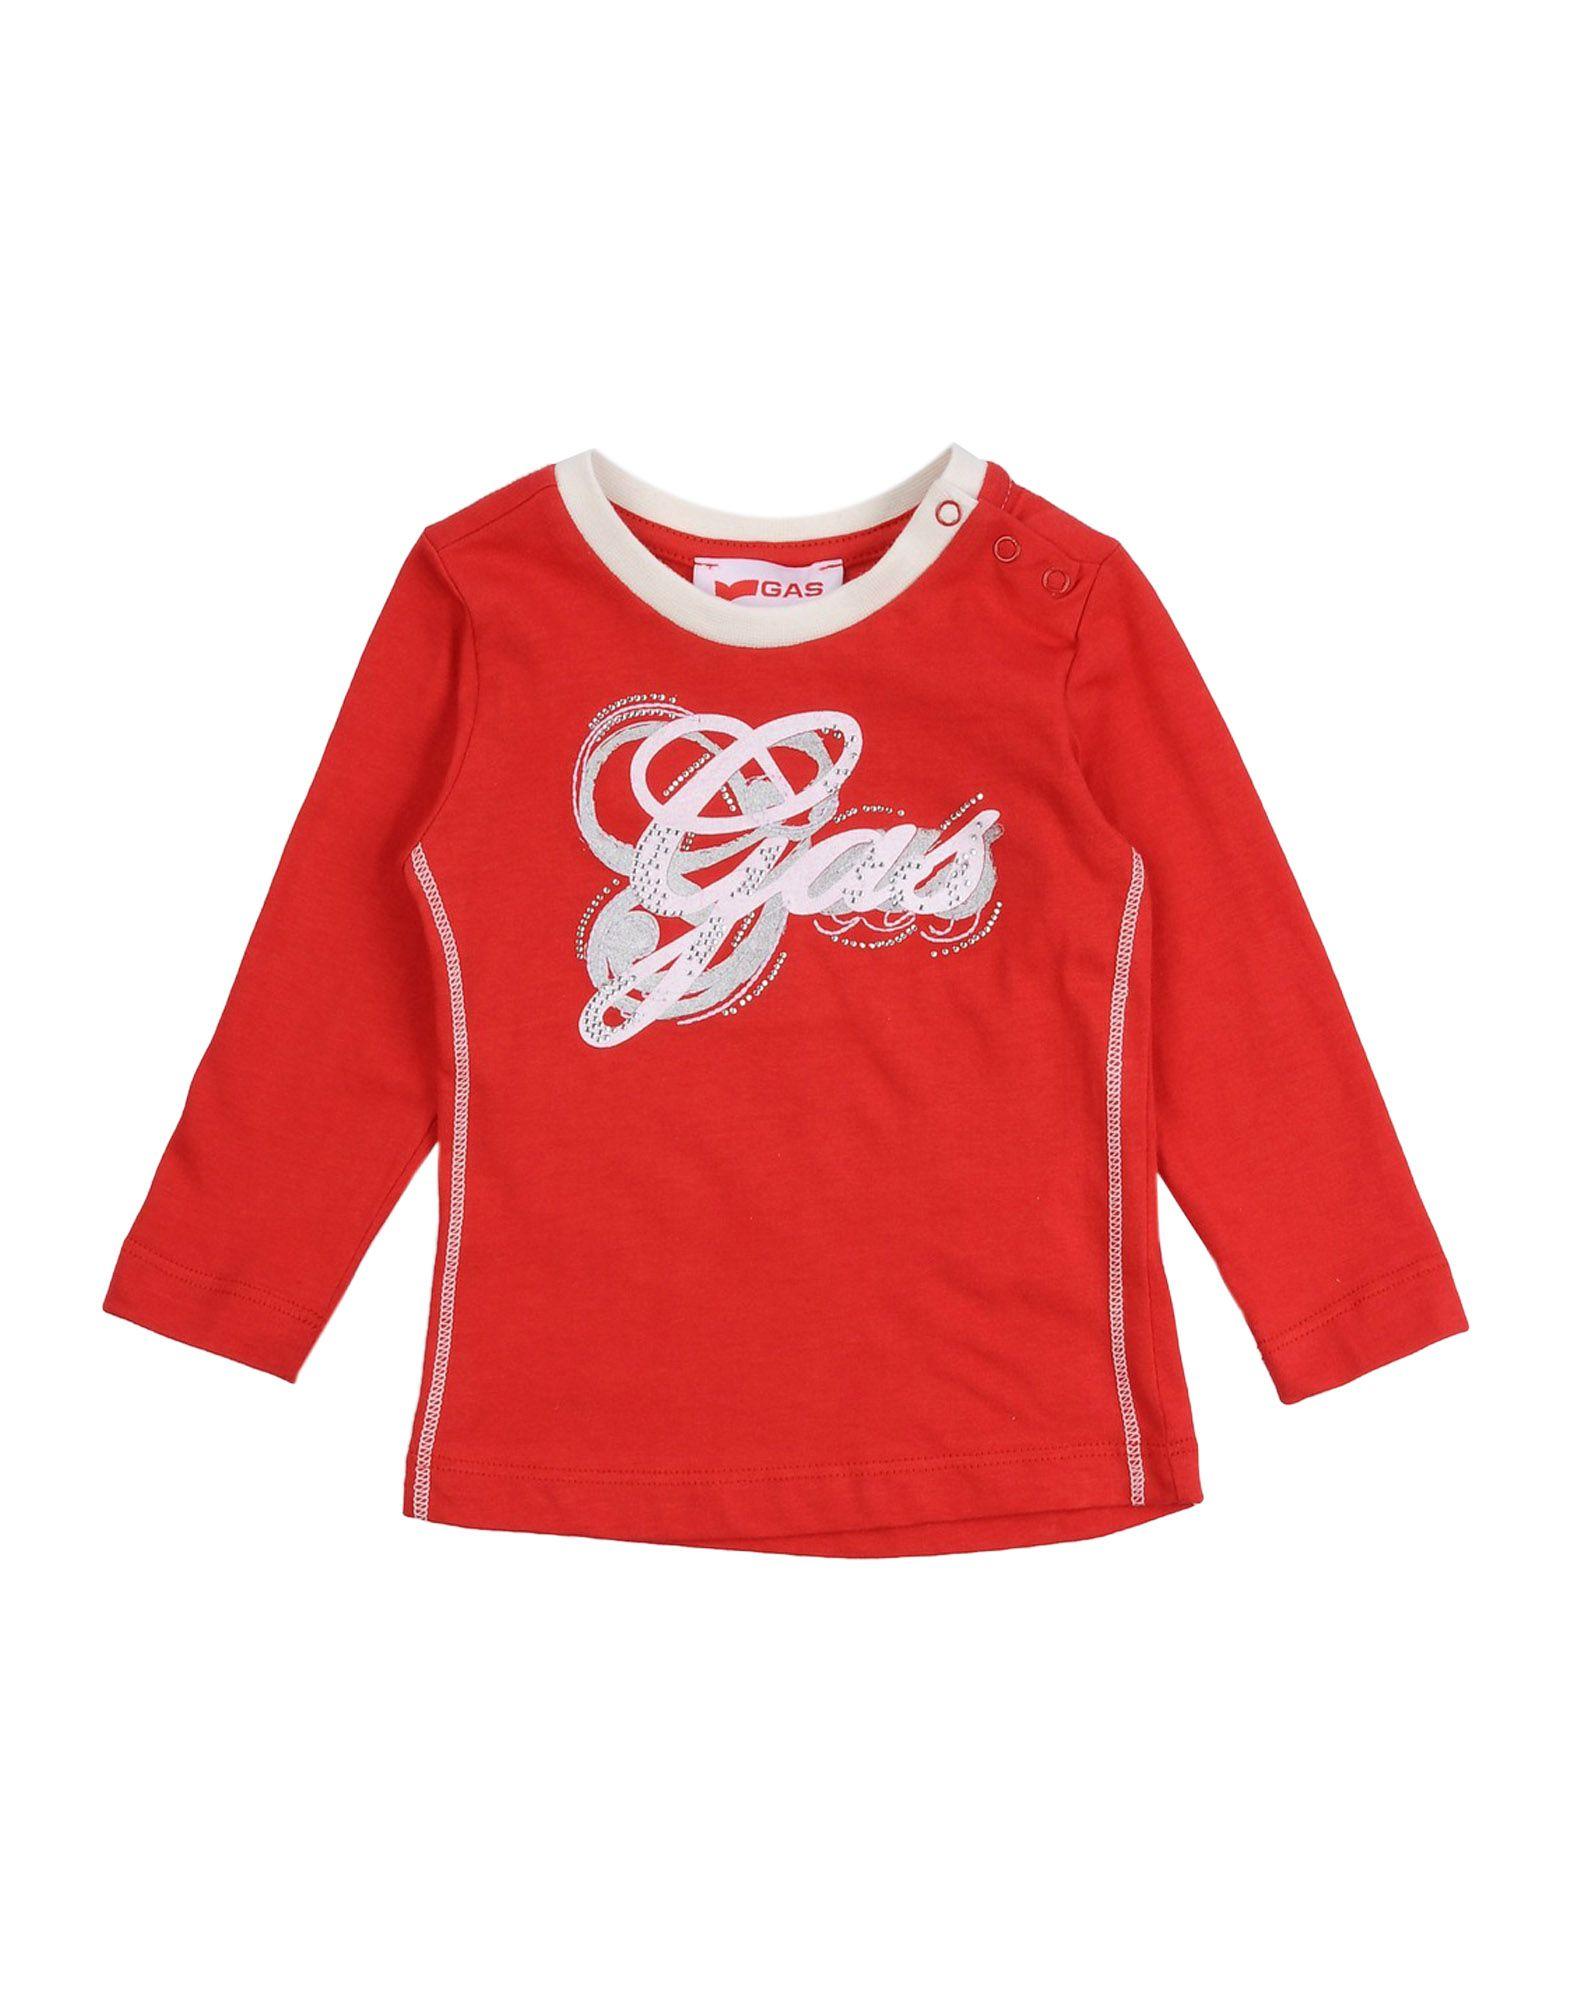 GAS Mädchen 0-24 monate T-shirts Farbe Rot Größe 5